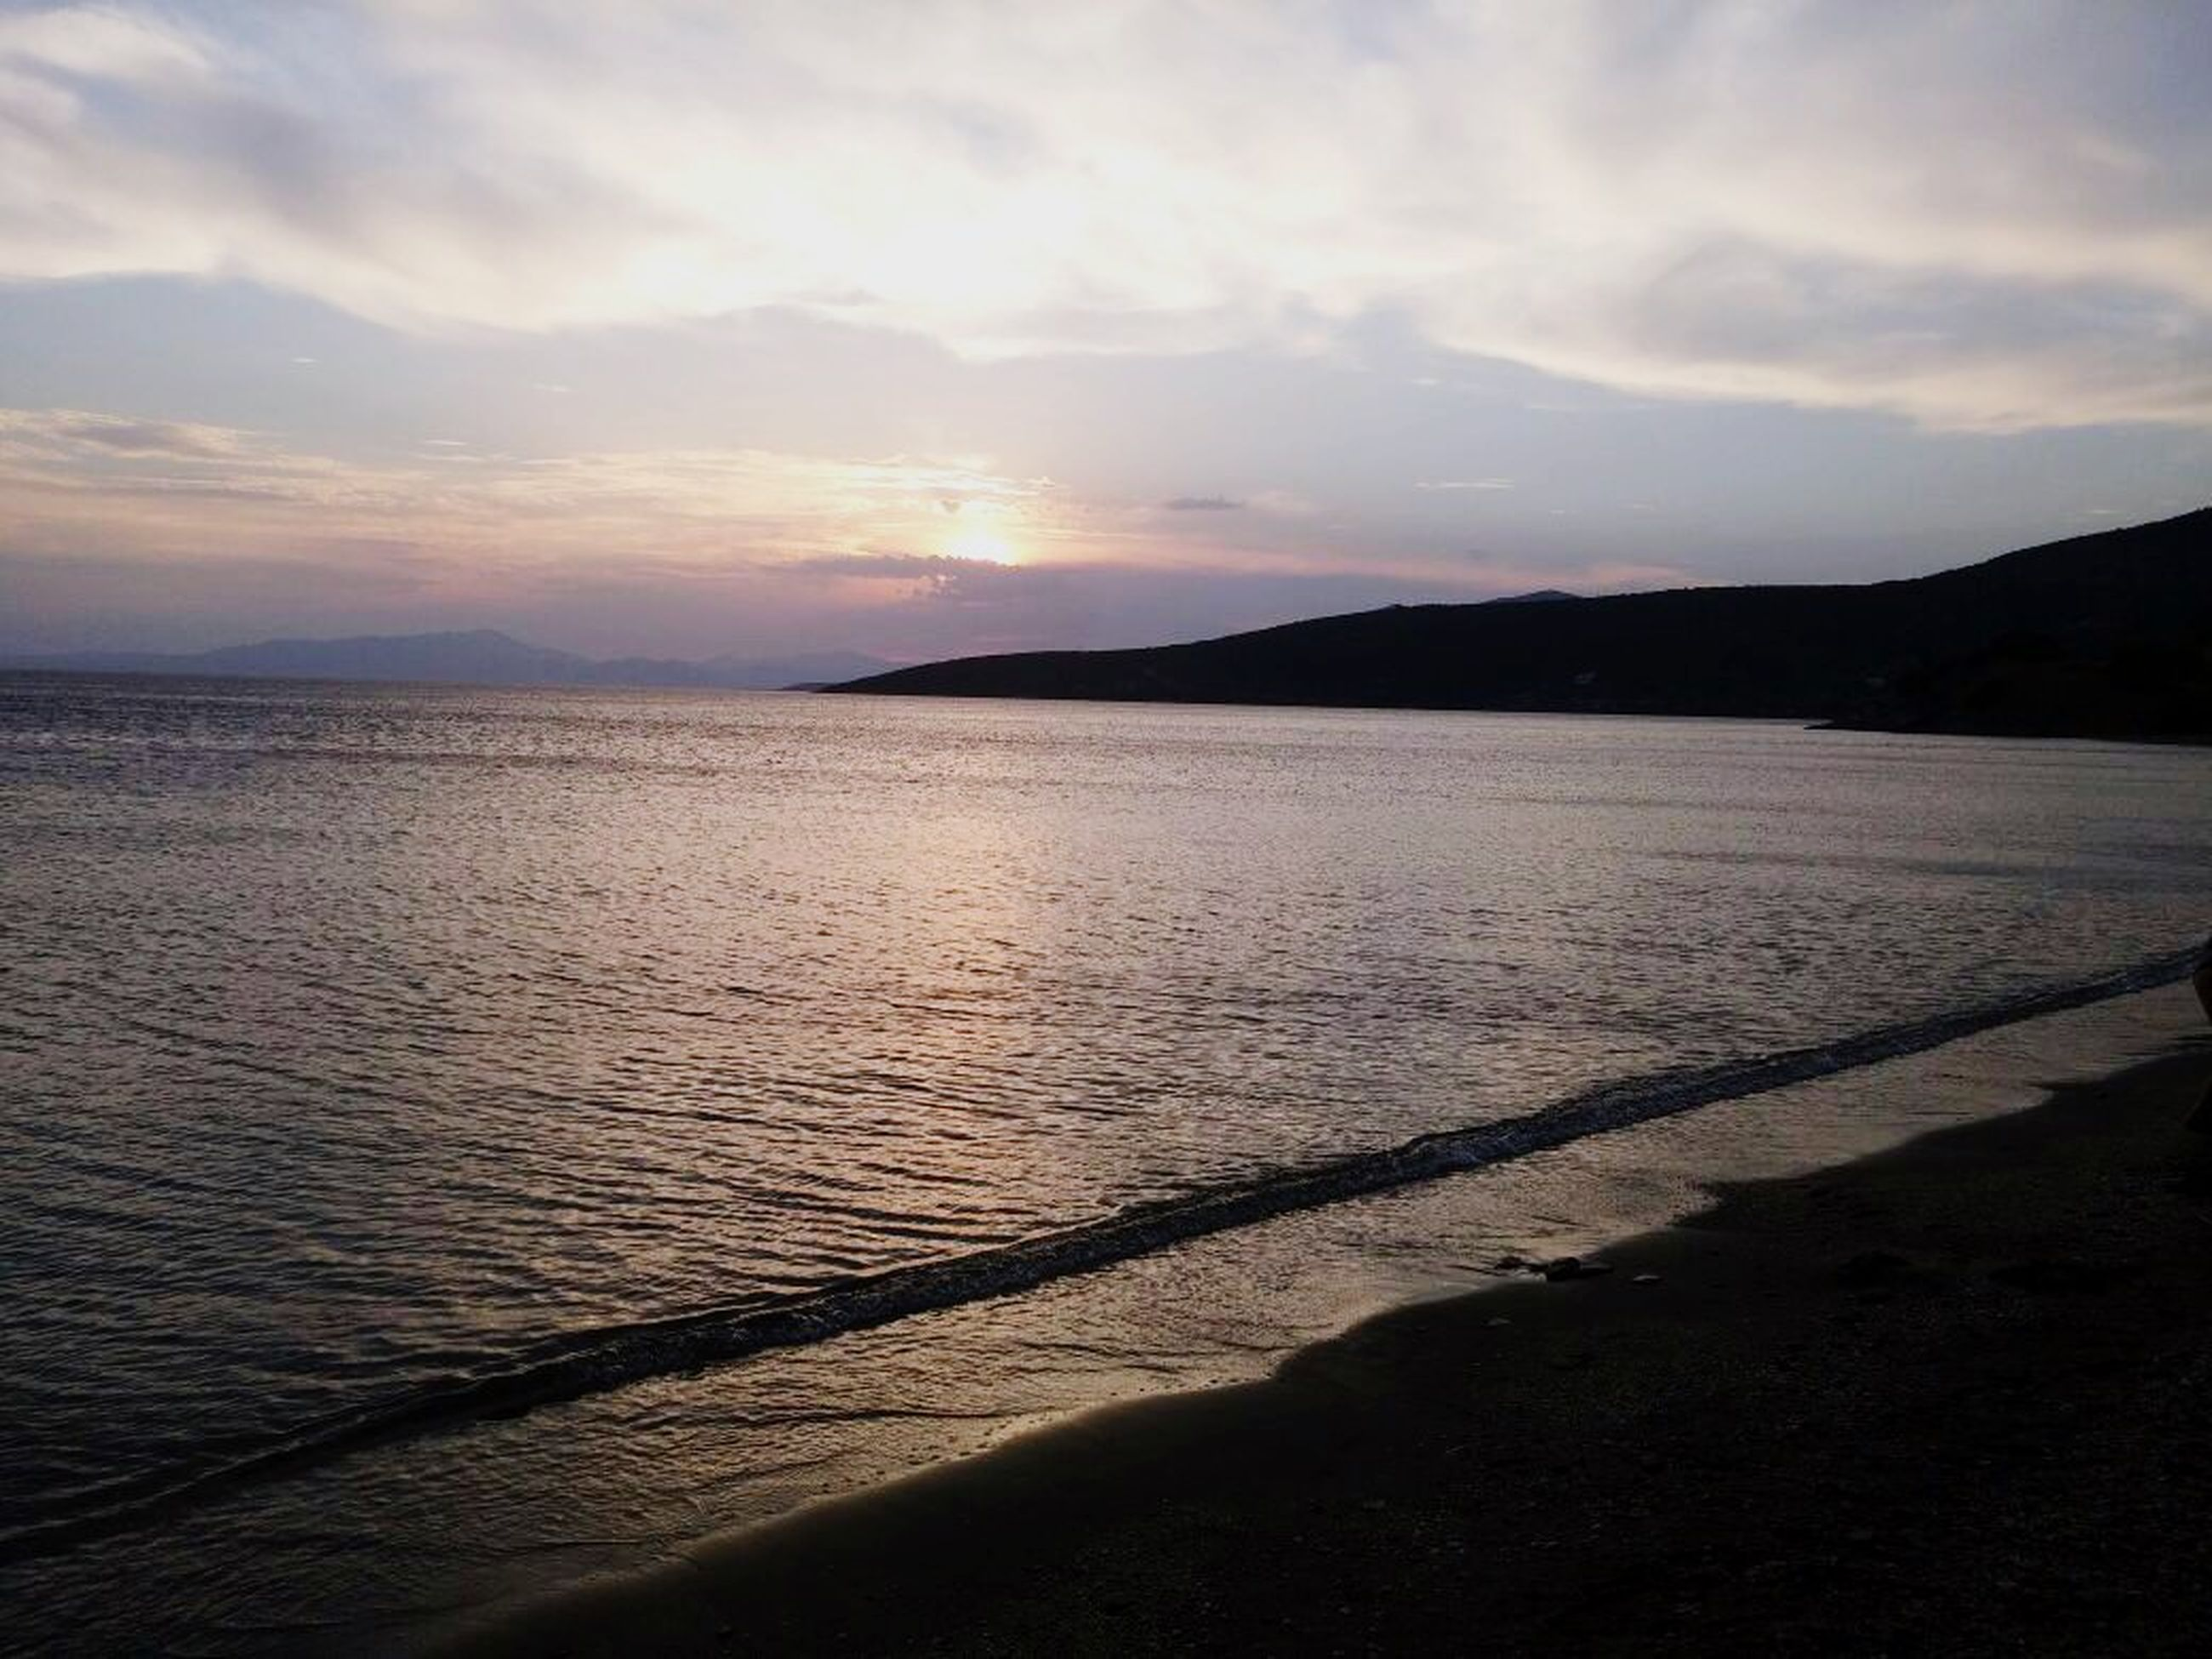 water, sunset, tranquil scene, scenics, sea, tranquility, beauty in nature, beach, sky, shore, nature, idyllic, sand, silhouette, coastline, cloud - sky, mountain, cloud, rippled, orange color